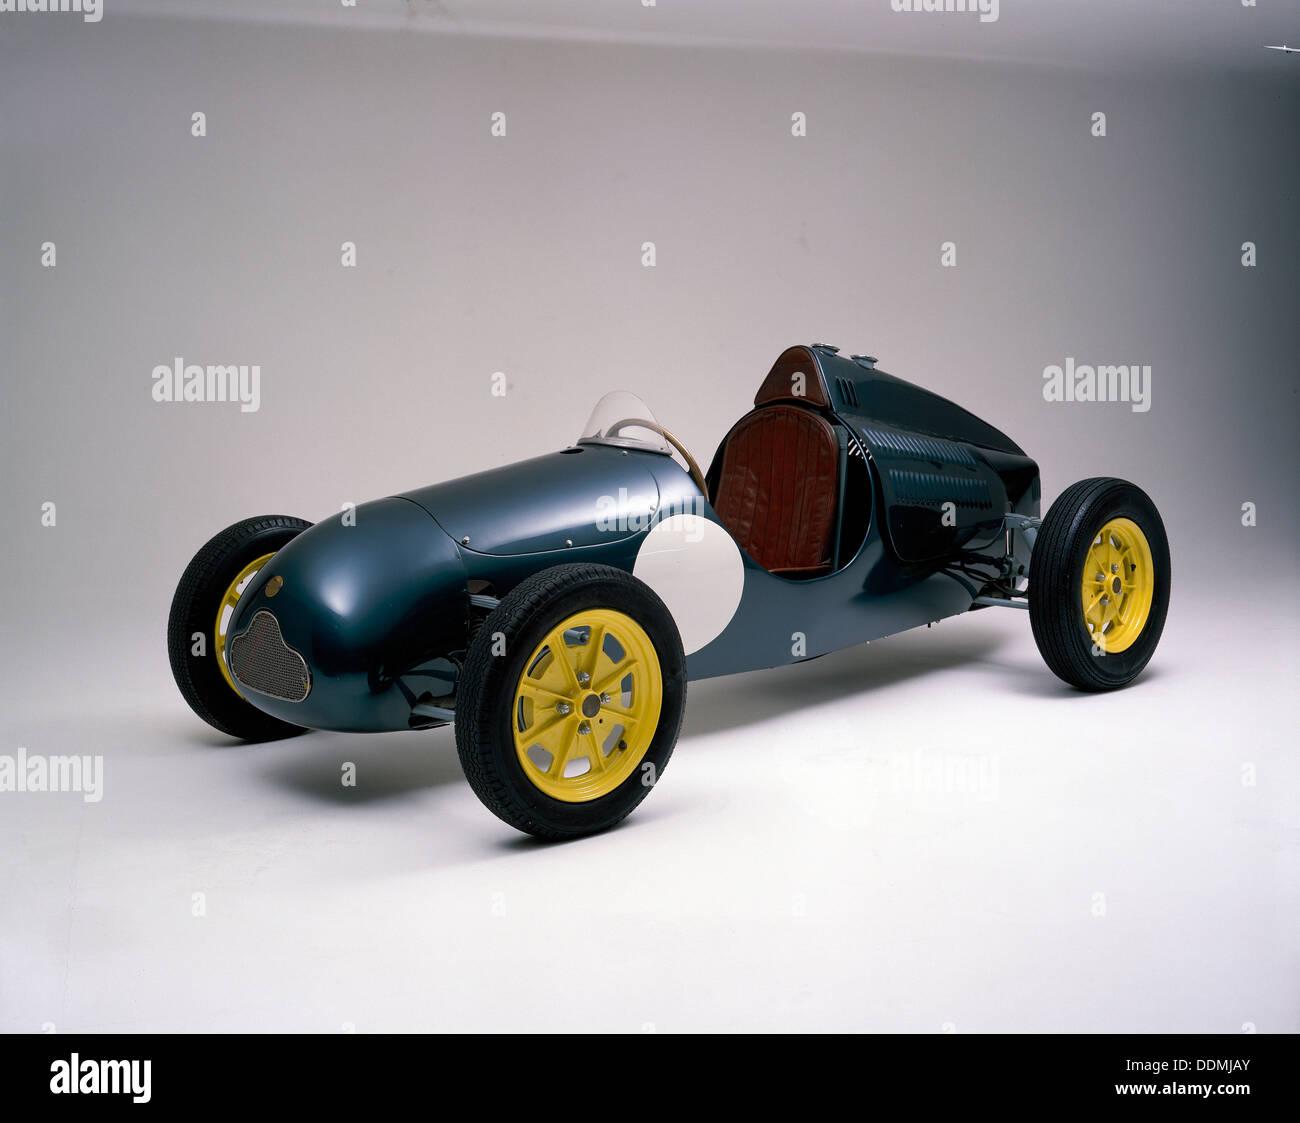 1949 Cooper 500 MK III racing car. - Stock Image